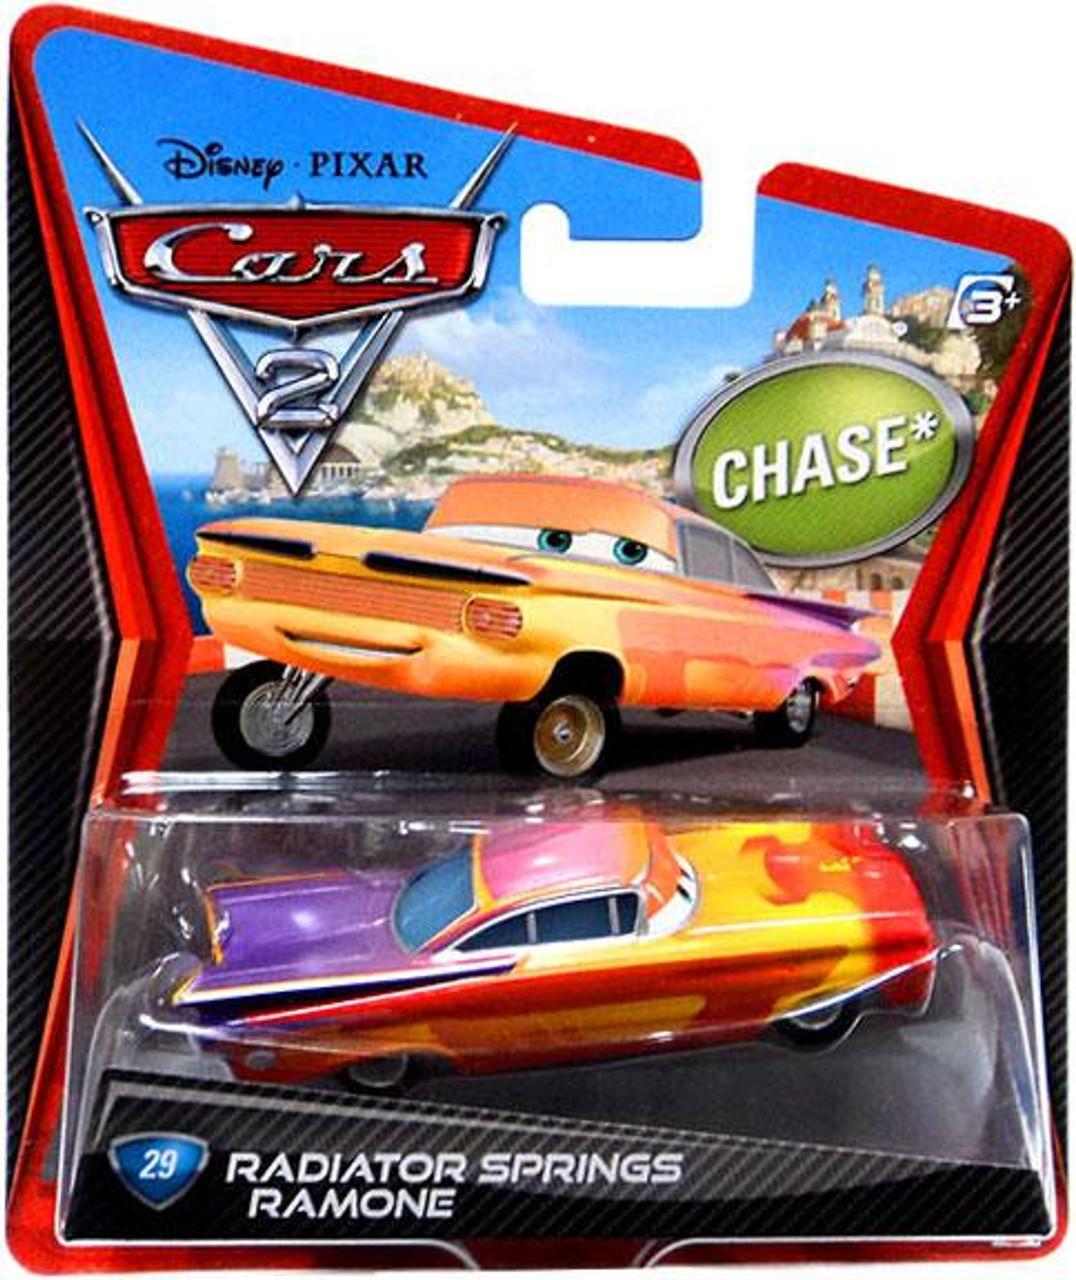 Disney Cars Cars 2 Main Series Radiator Springs Ramone Diecast Car